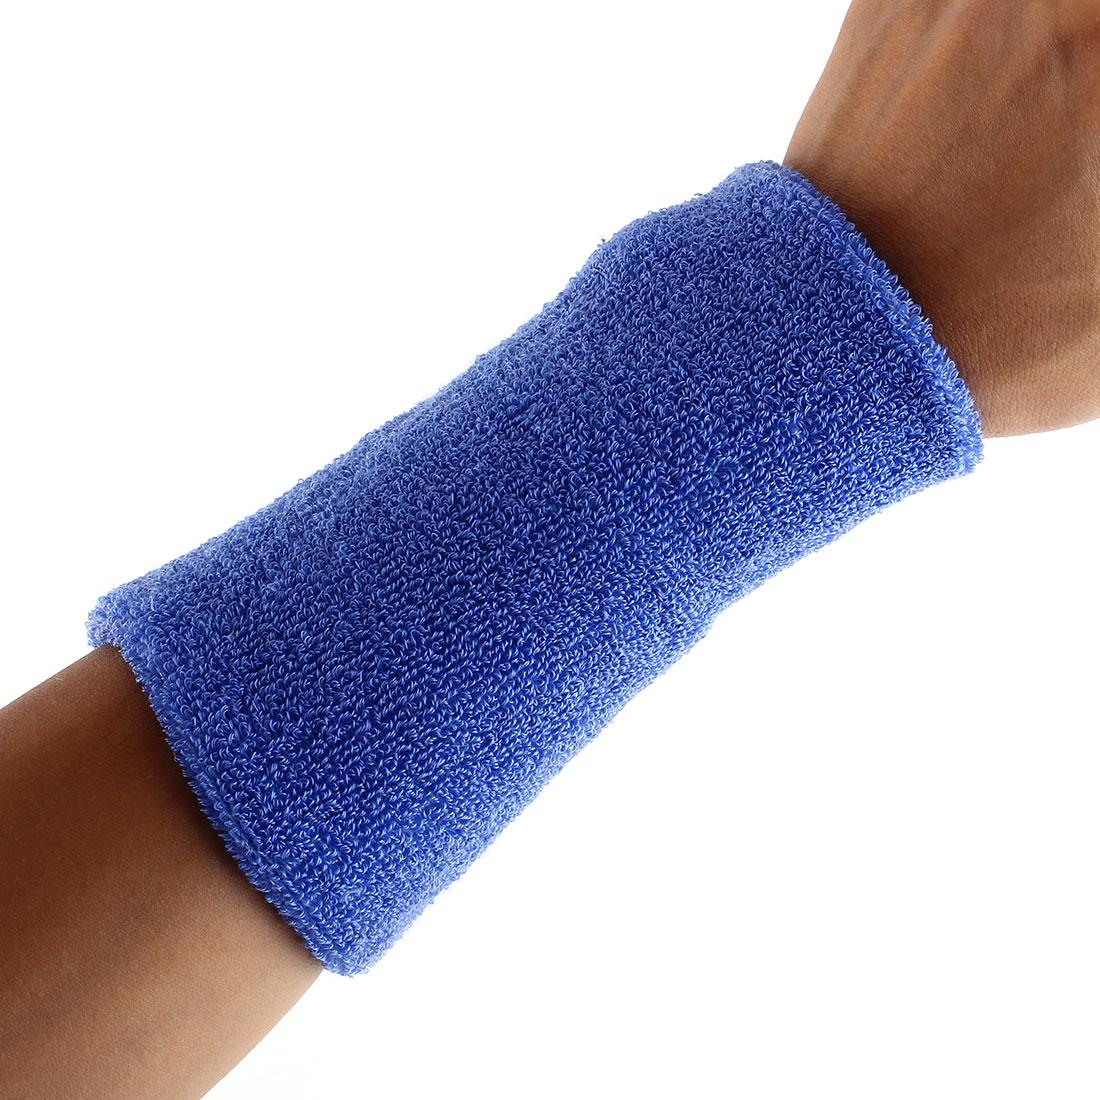 Exercises Basketball Running Hand Support Bandage Sweatband Wristband Sport Wrist Yale Blue 15cm Long 2pcs